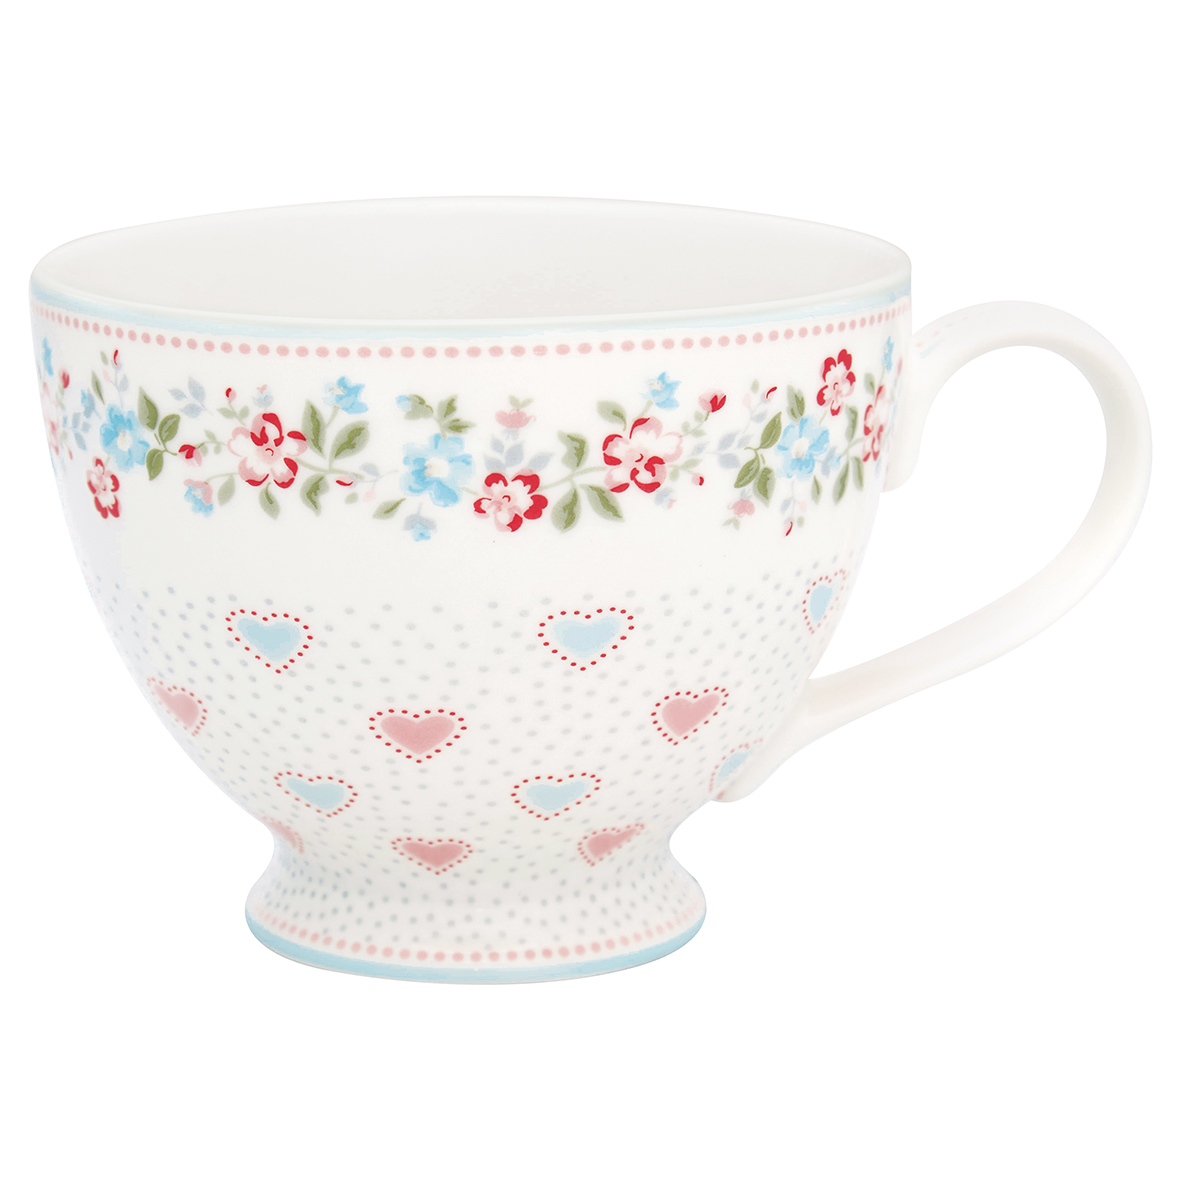 Greengate Teacup Sonia white Becher